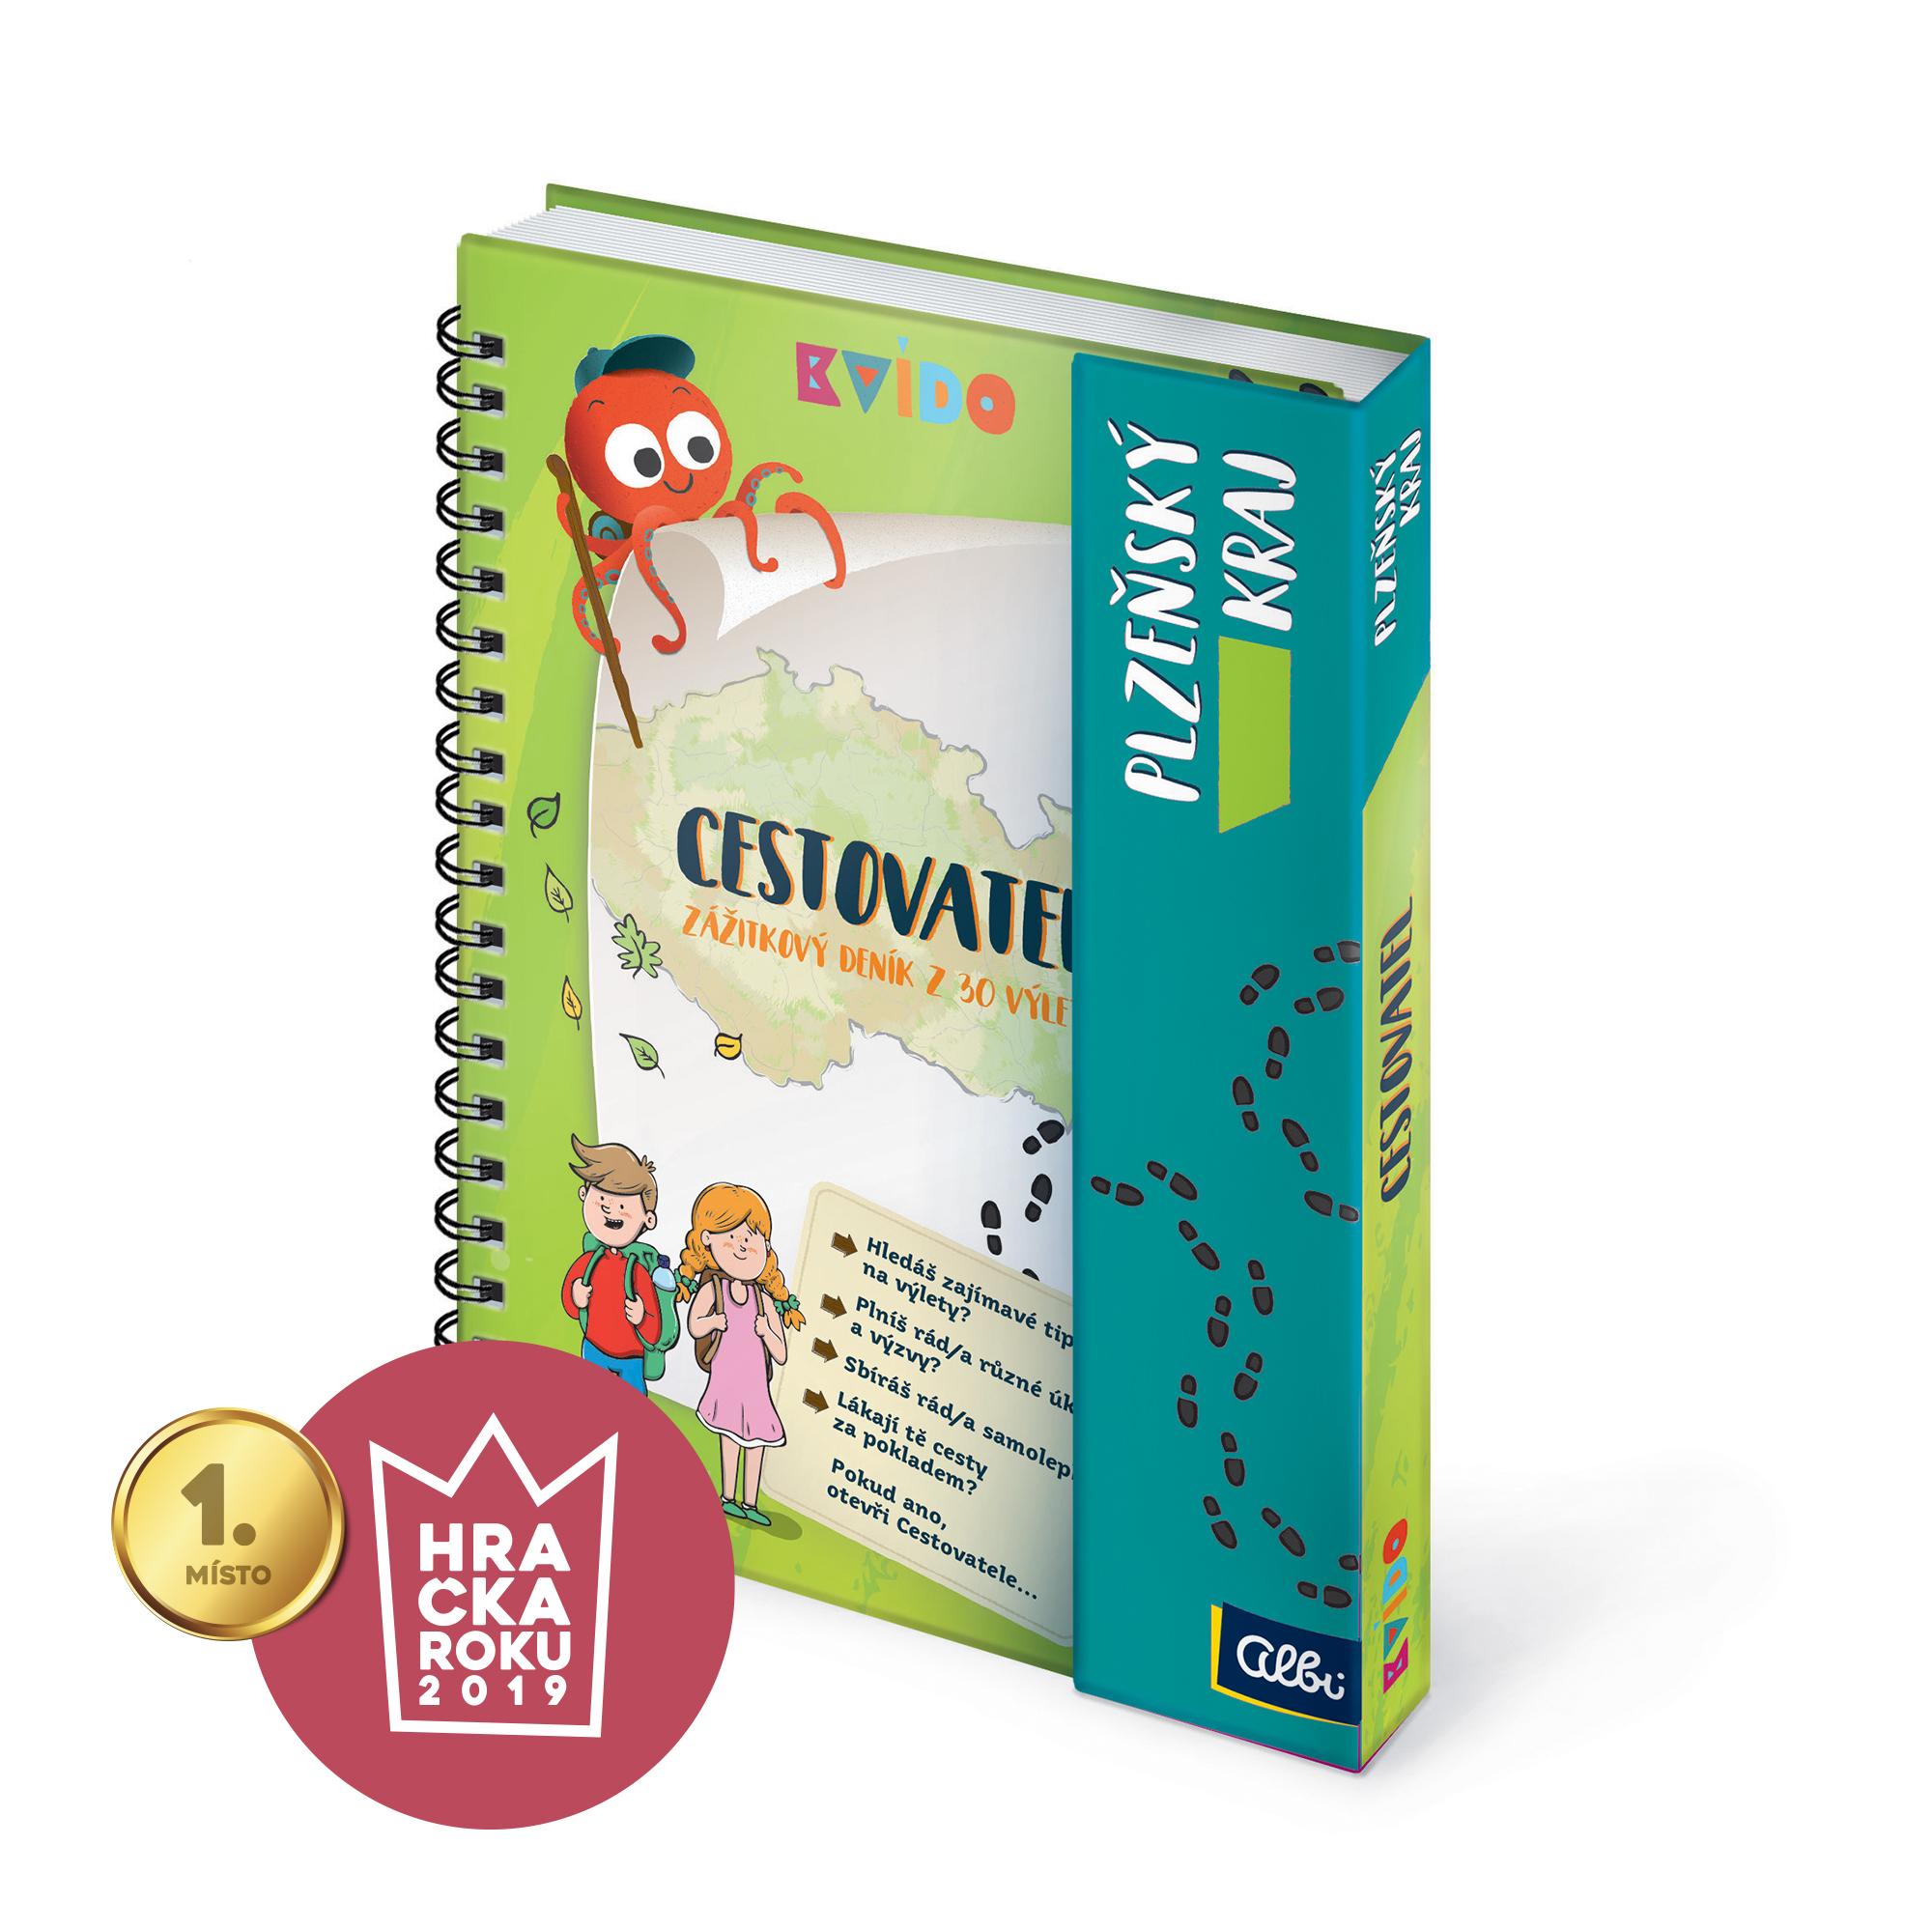 Zážitkové deníky - Kvído - Plzeňský zážitkový deník